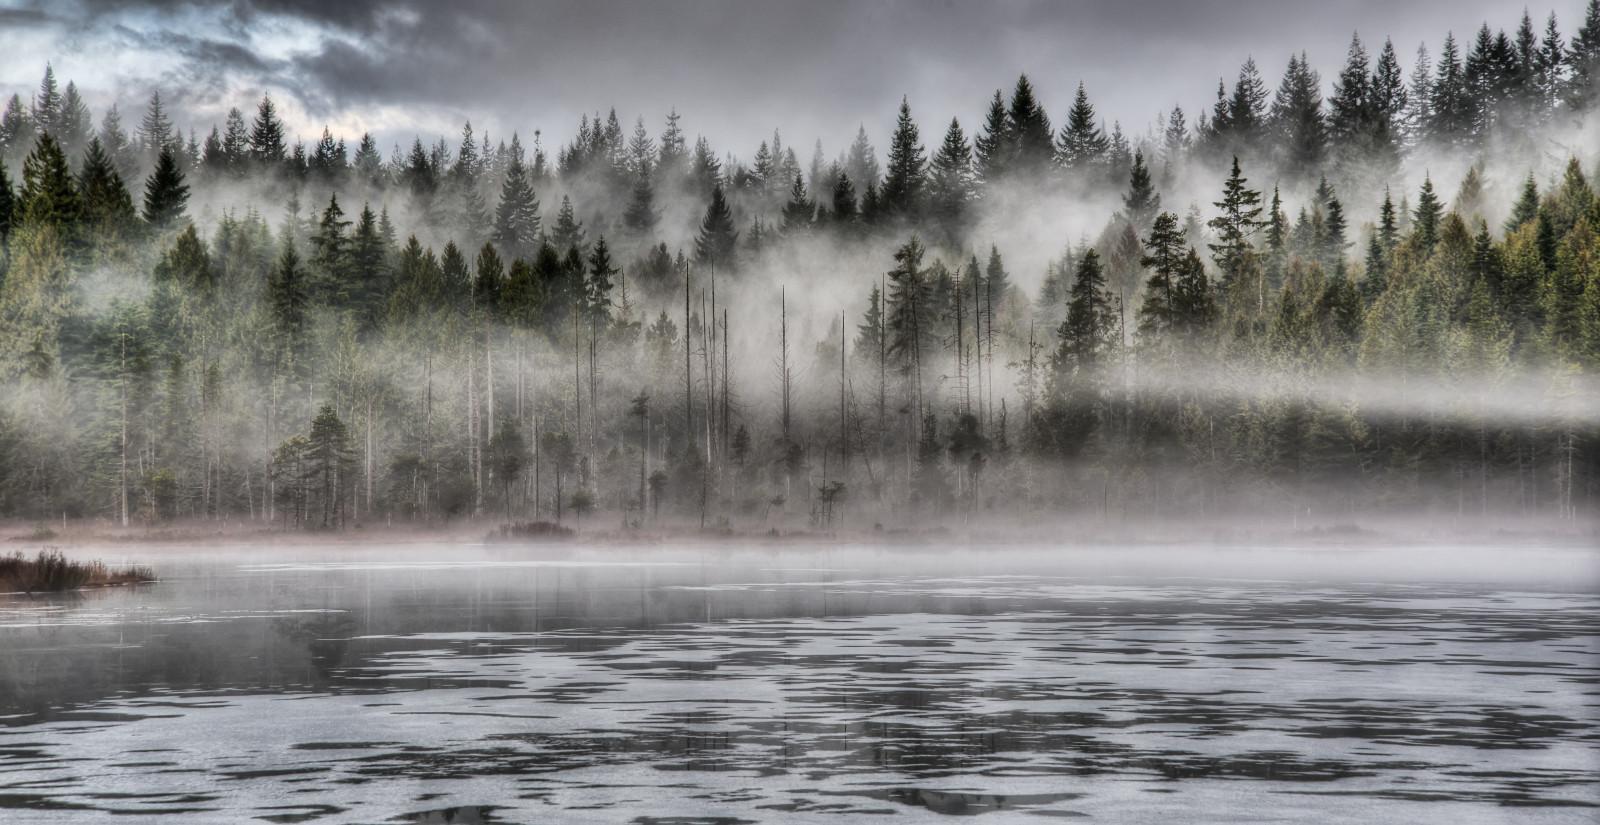 Misty Green Forest Nature River Beautiful 1ziw: Wallpaper : Park, Wood, Morning, Travel, Light, Sky, Mist